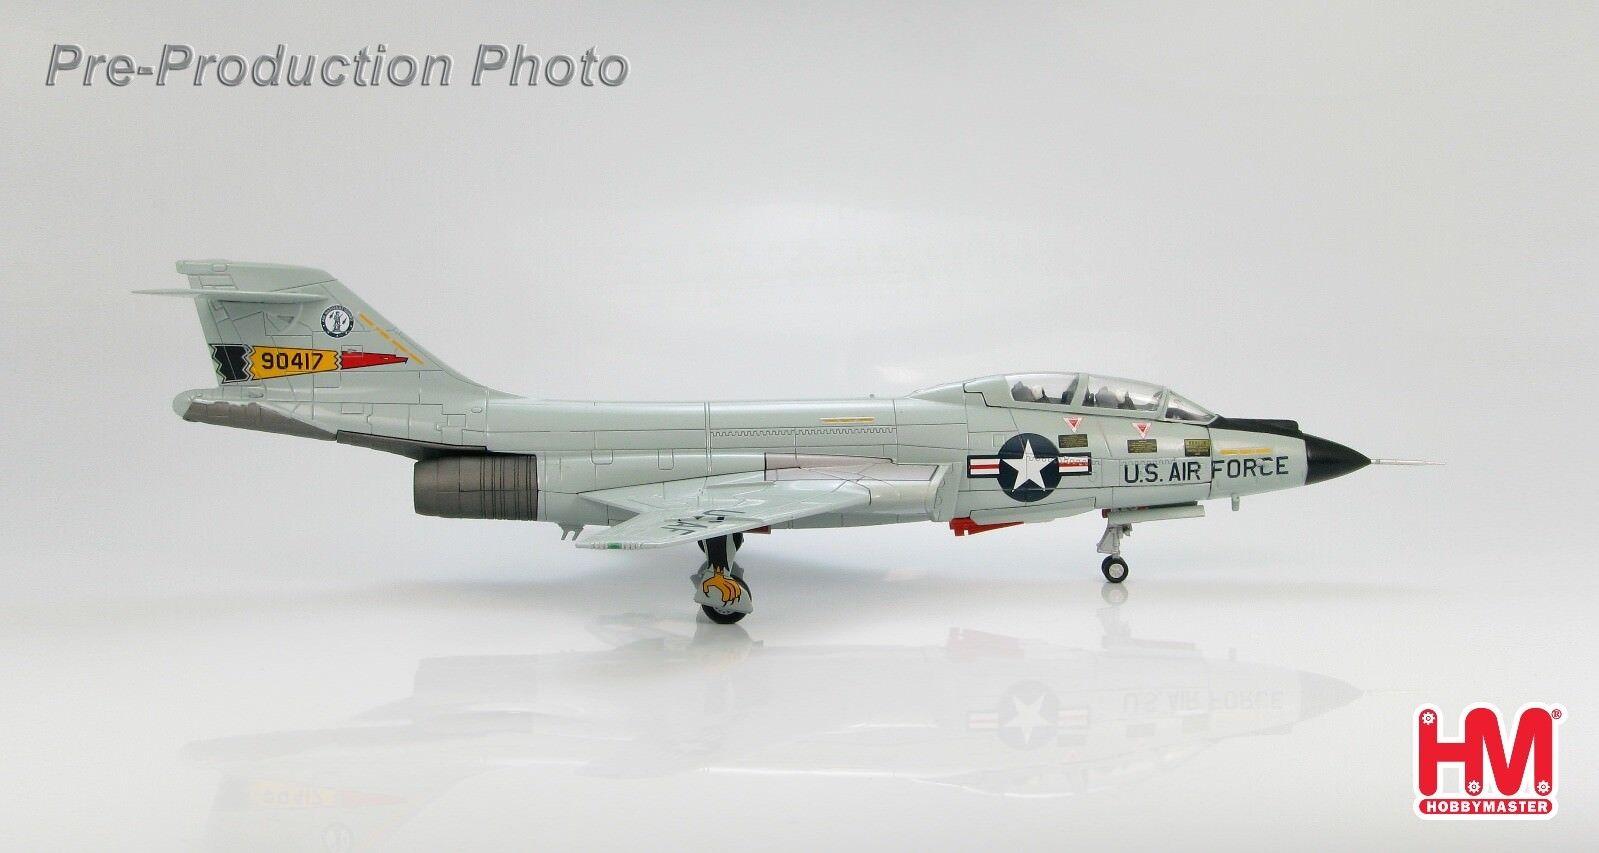 Hobby Master HA3705 1/72 McDonnell F-101B Voodoo FIS, Nueva York Ang 136th, 2018